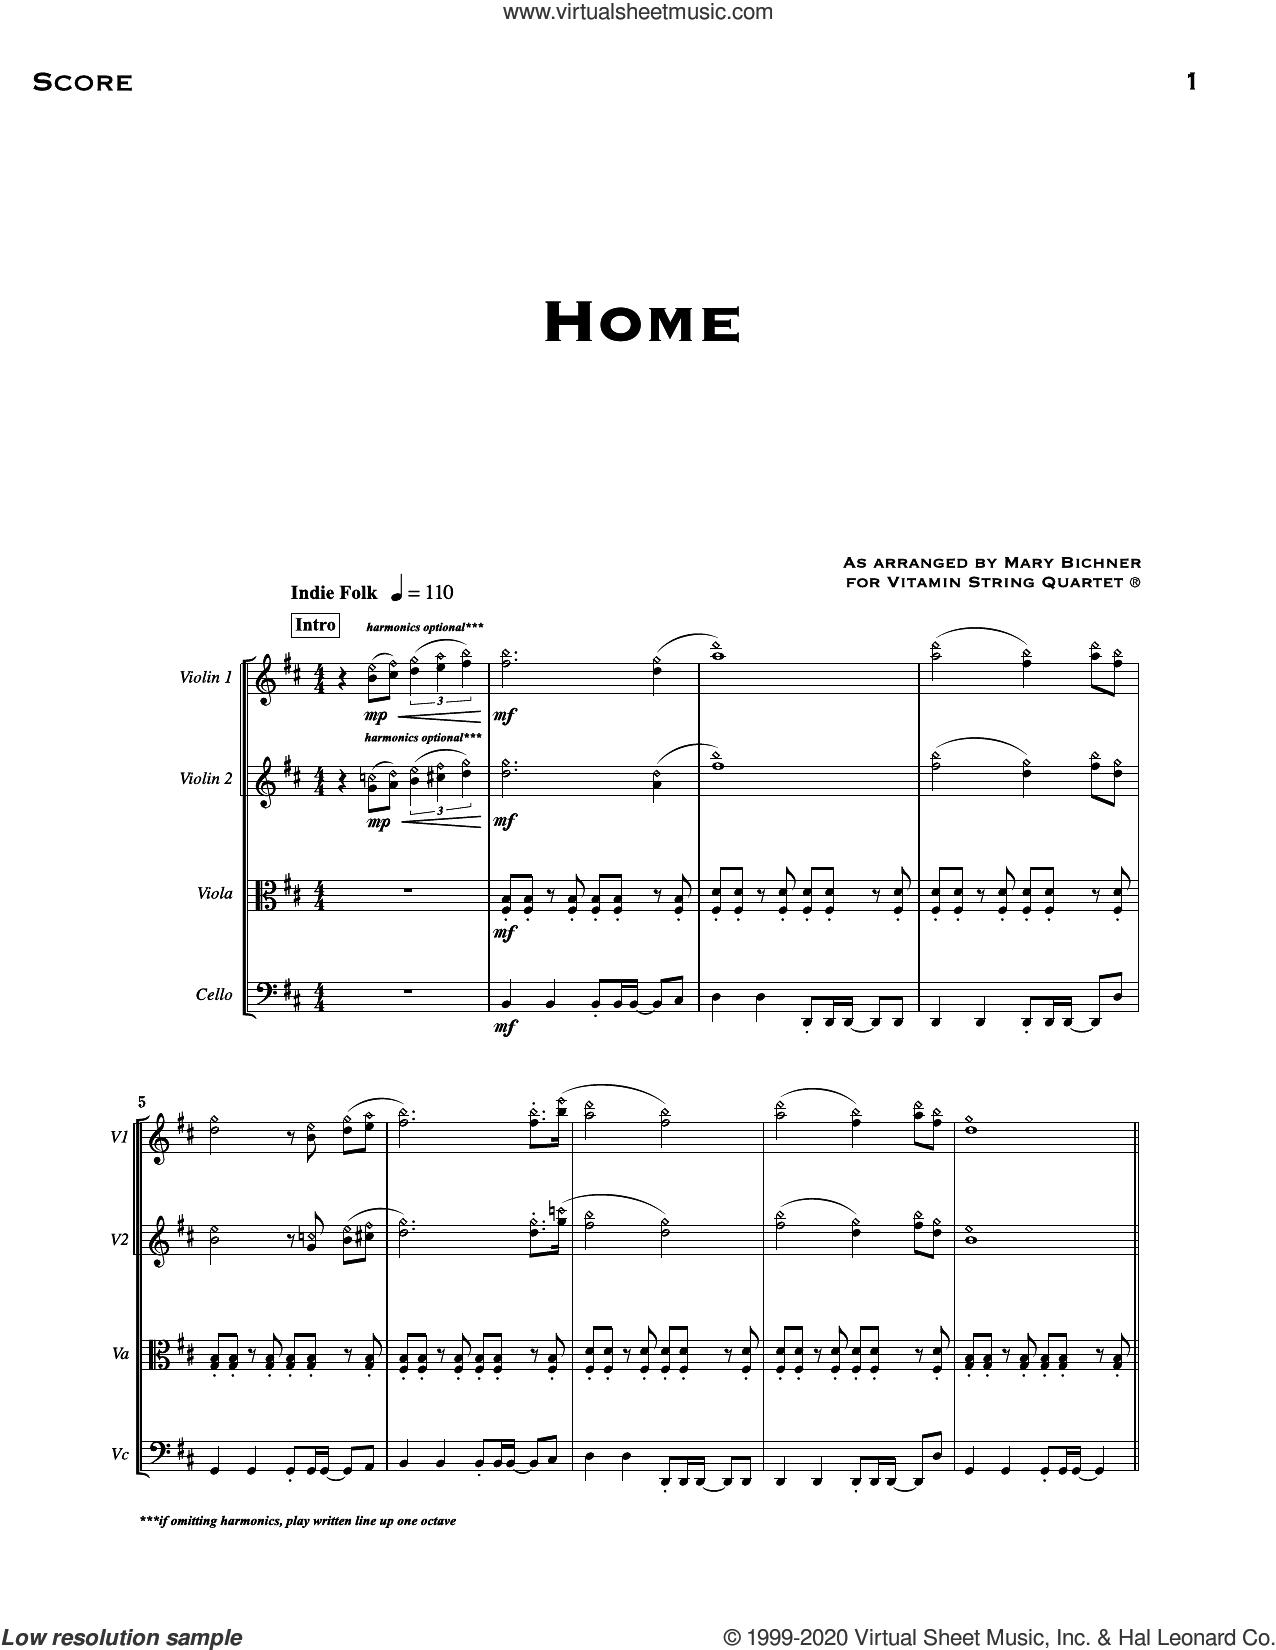 Home (arr. Mary Bichner) (COMPLETE) sheet music for string quartet (violin, viola, cello) by Vitamin String Quartet, Alex Ebert, Edward Sharpe & the Magnetic Zeros, Jade Castrinos and Mary Bichner, intermediate skill level